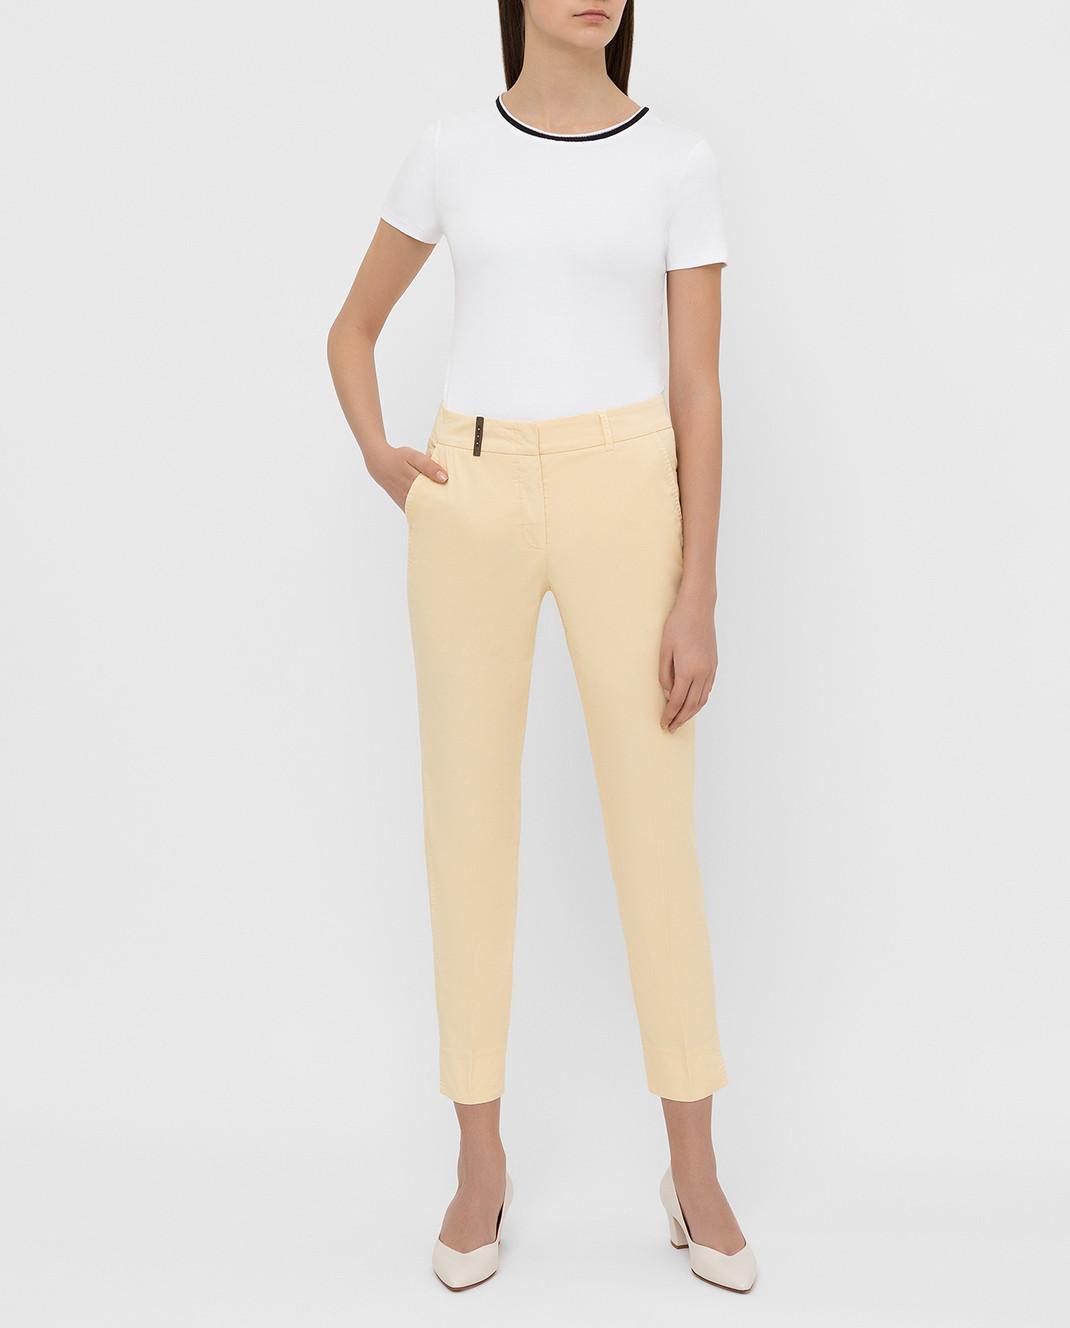 Peserico Светло-желтые брюки P04718T402477 изображение 2